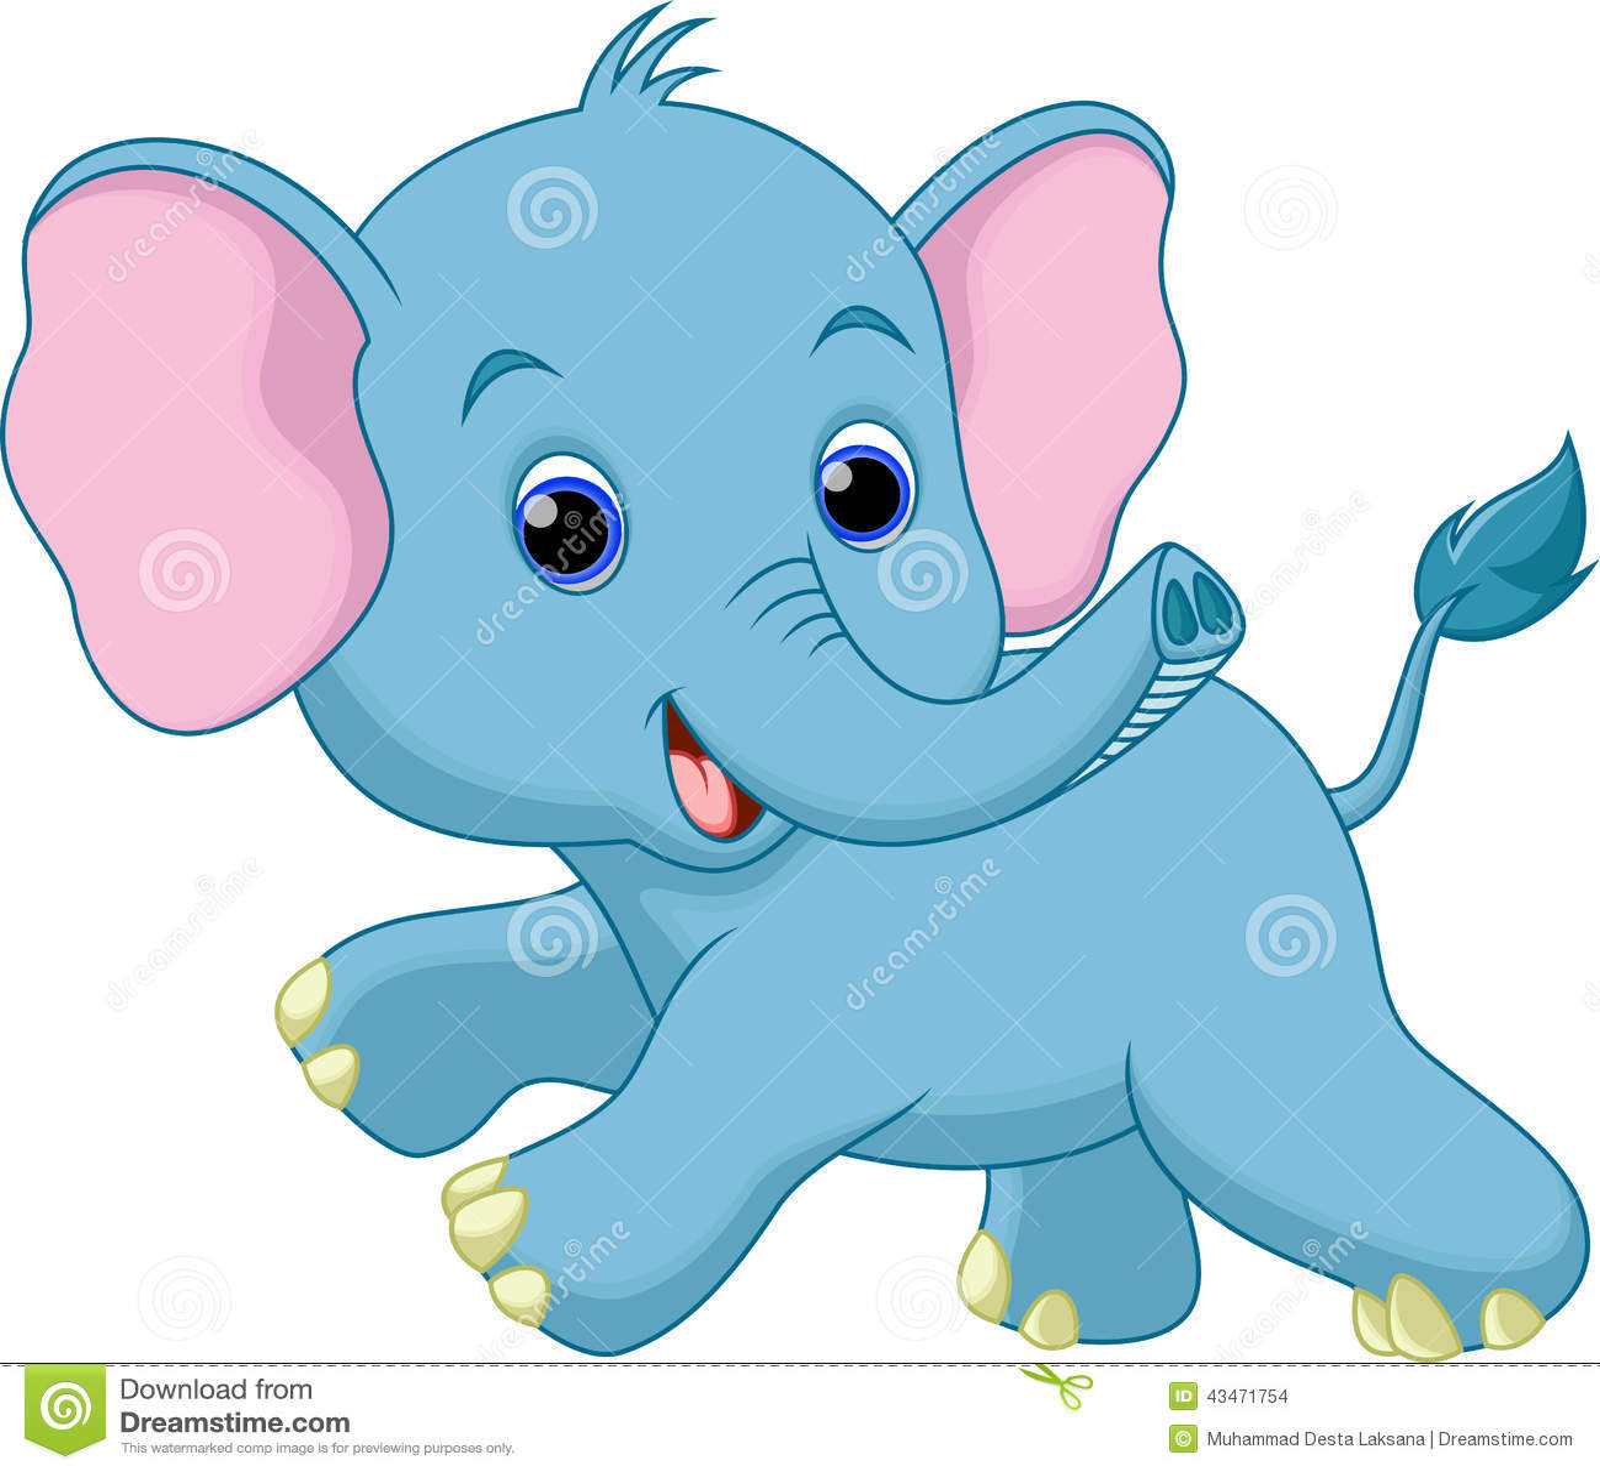 Cute Baby Elephant Cartoon Stock Illustration Image